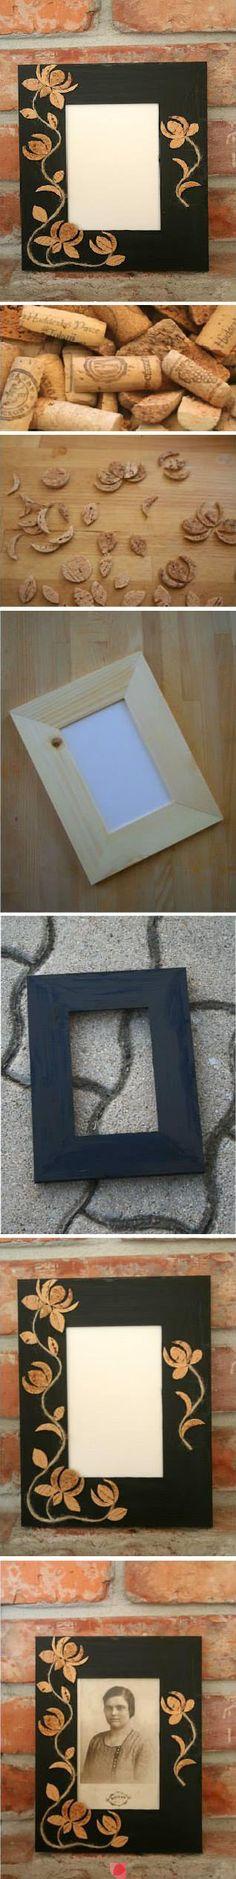 DIY cork photo frame